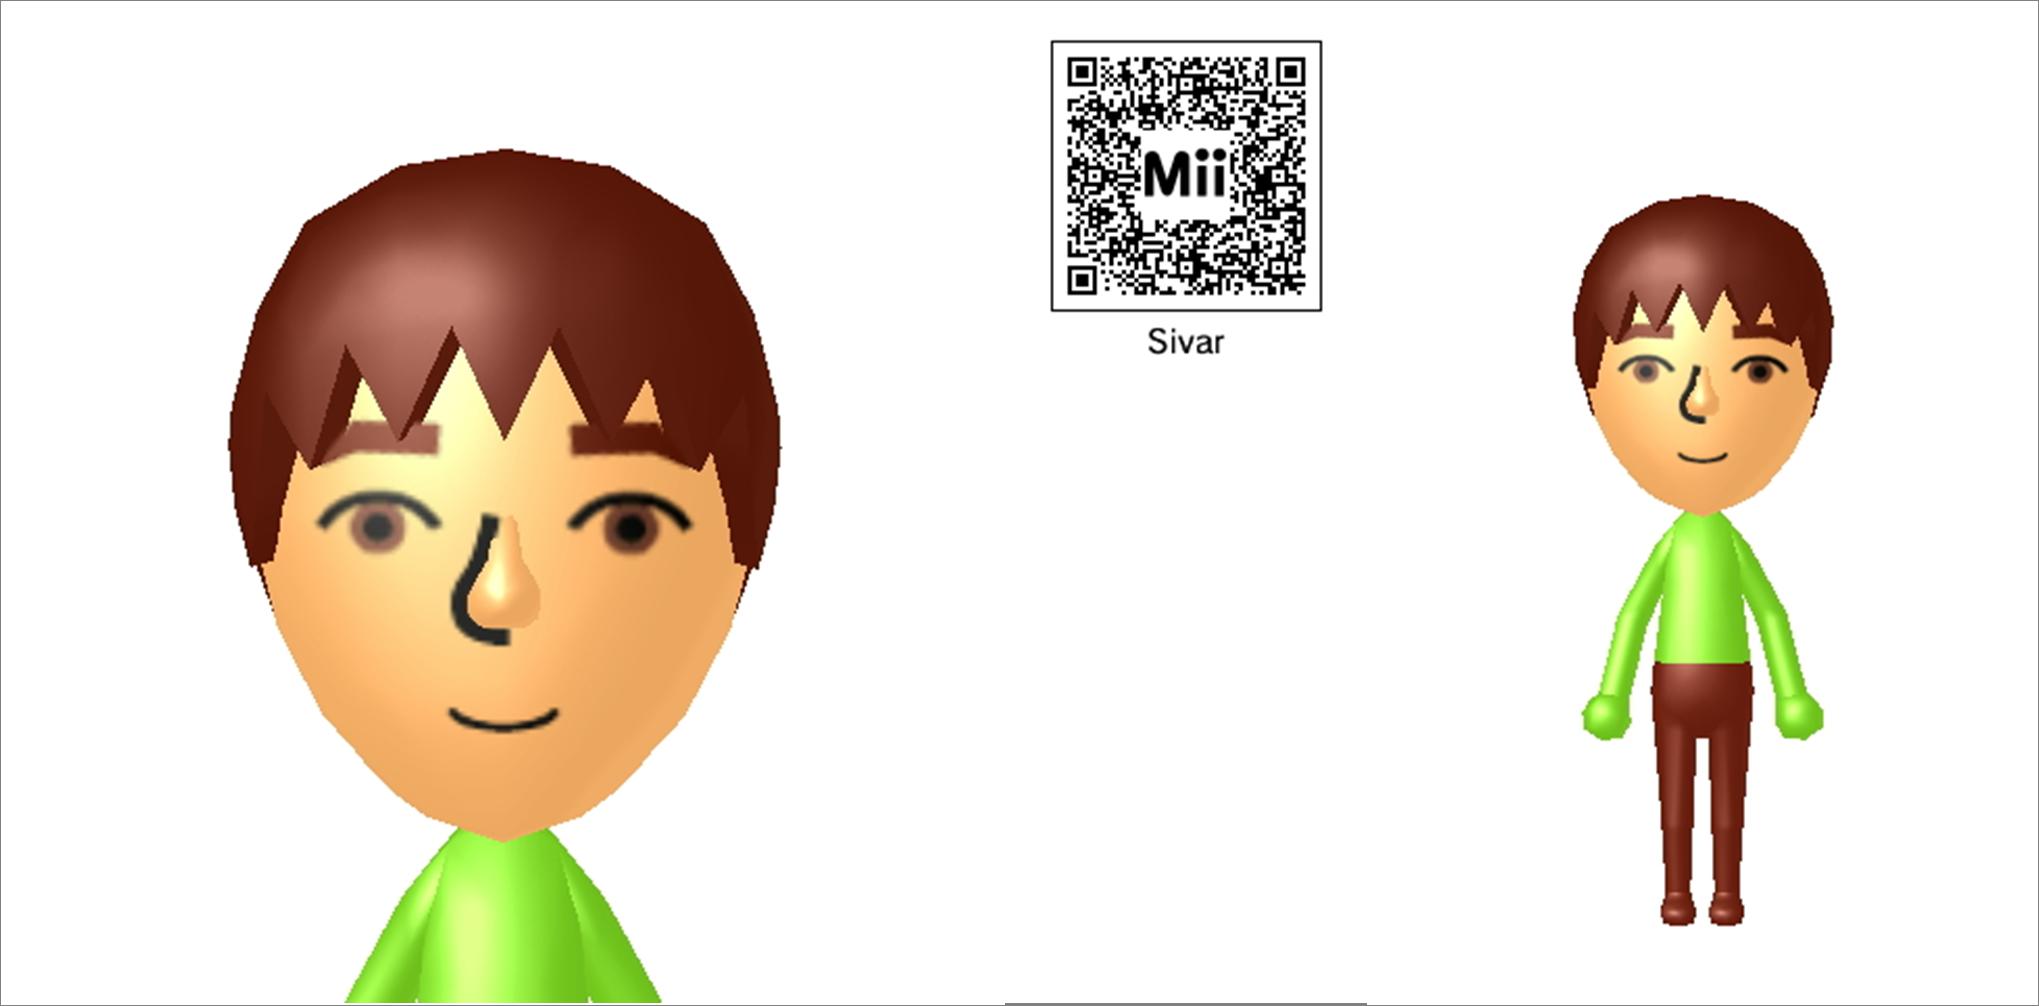 Anime Mii Characters 3ds : Mii ds sivar by sintonio on deviantart